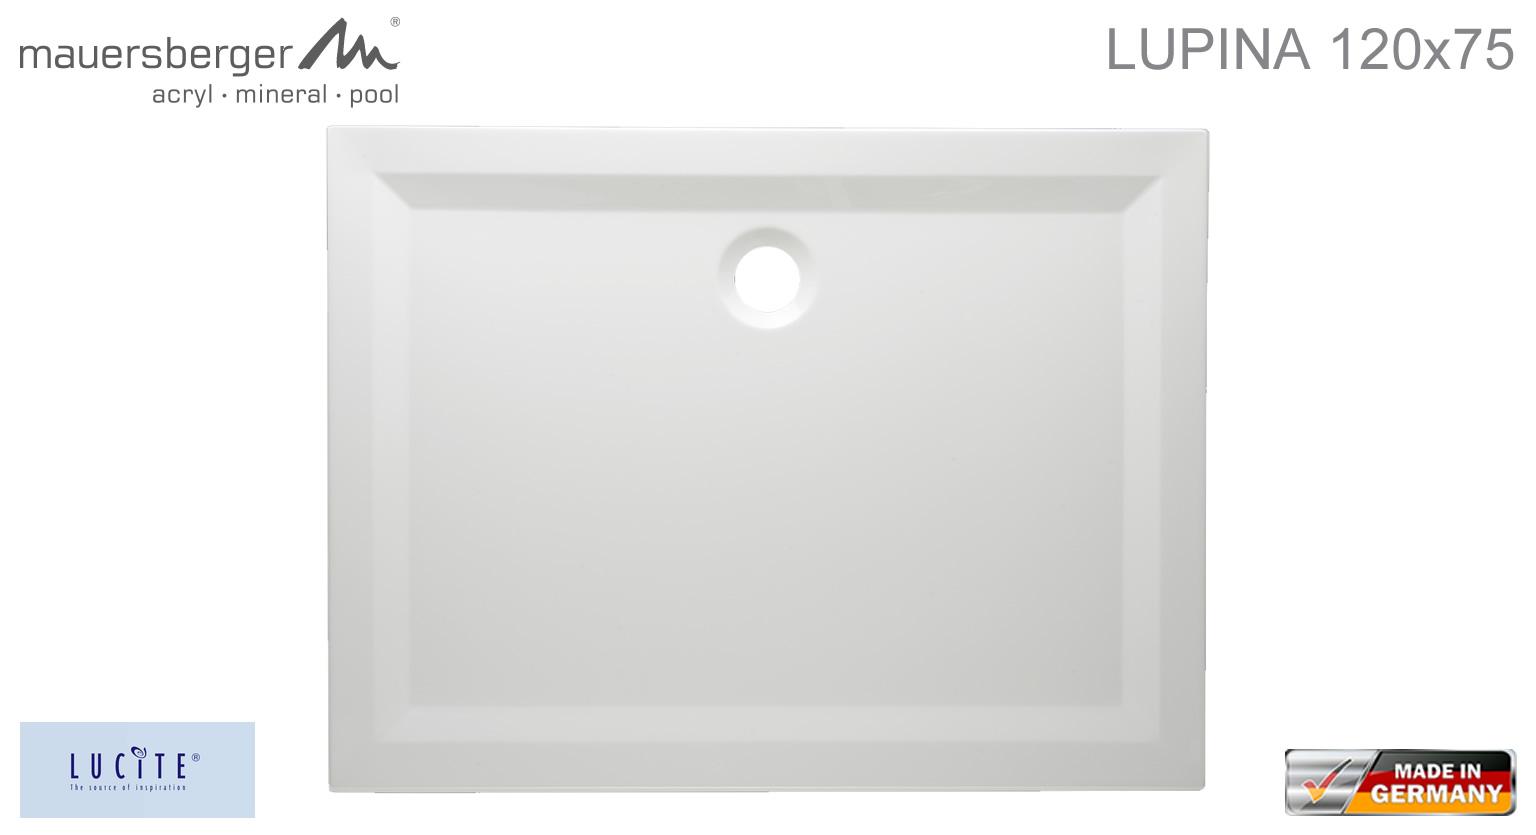 Mauersberger Duschwanne Lupina 120 X 75 Cm Superflach Impulsbad